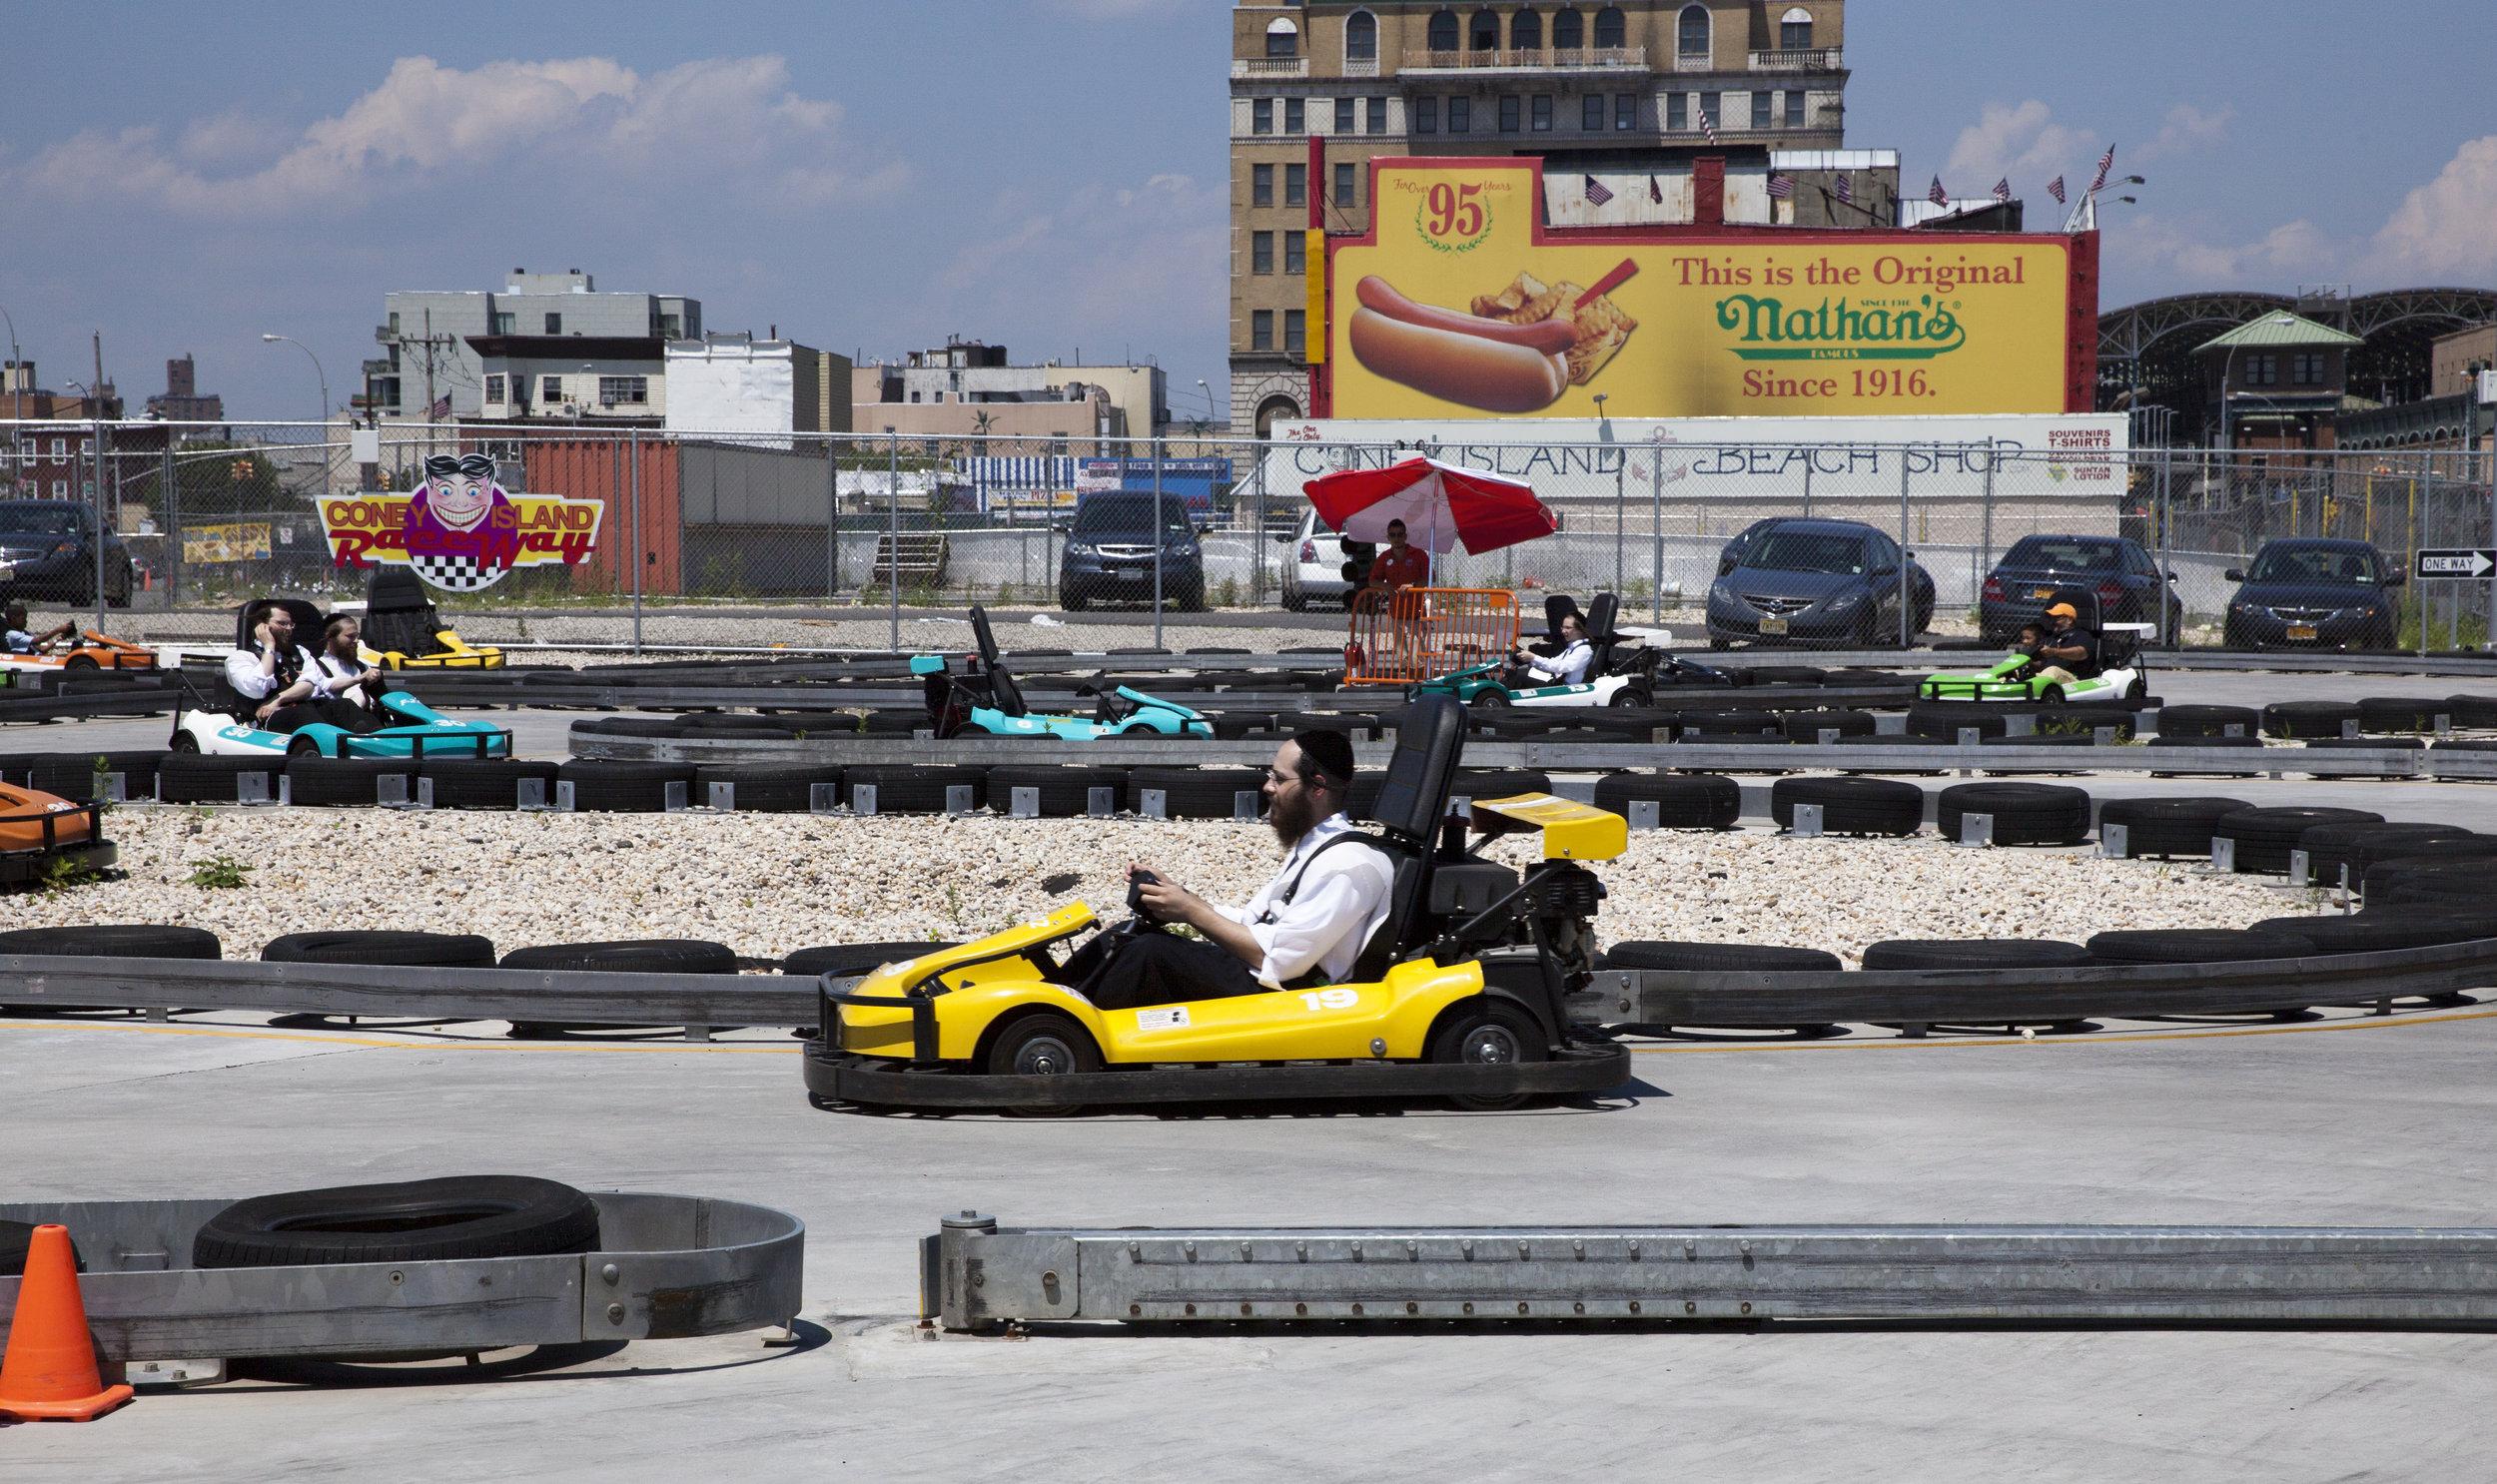 CITY LIFE: Four Hasidim enjoy a summer zip around the go-cart track at Coney Island - Brooklyn, New York